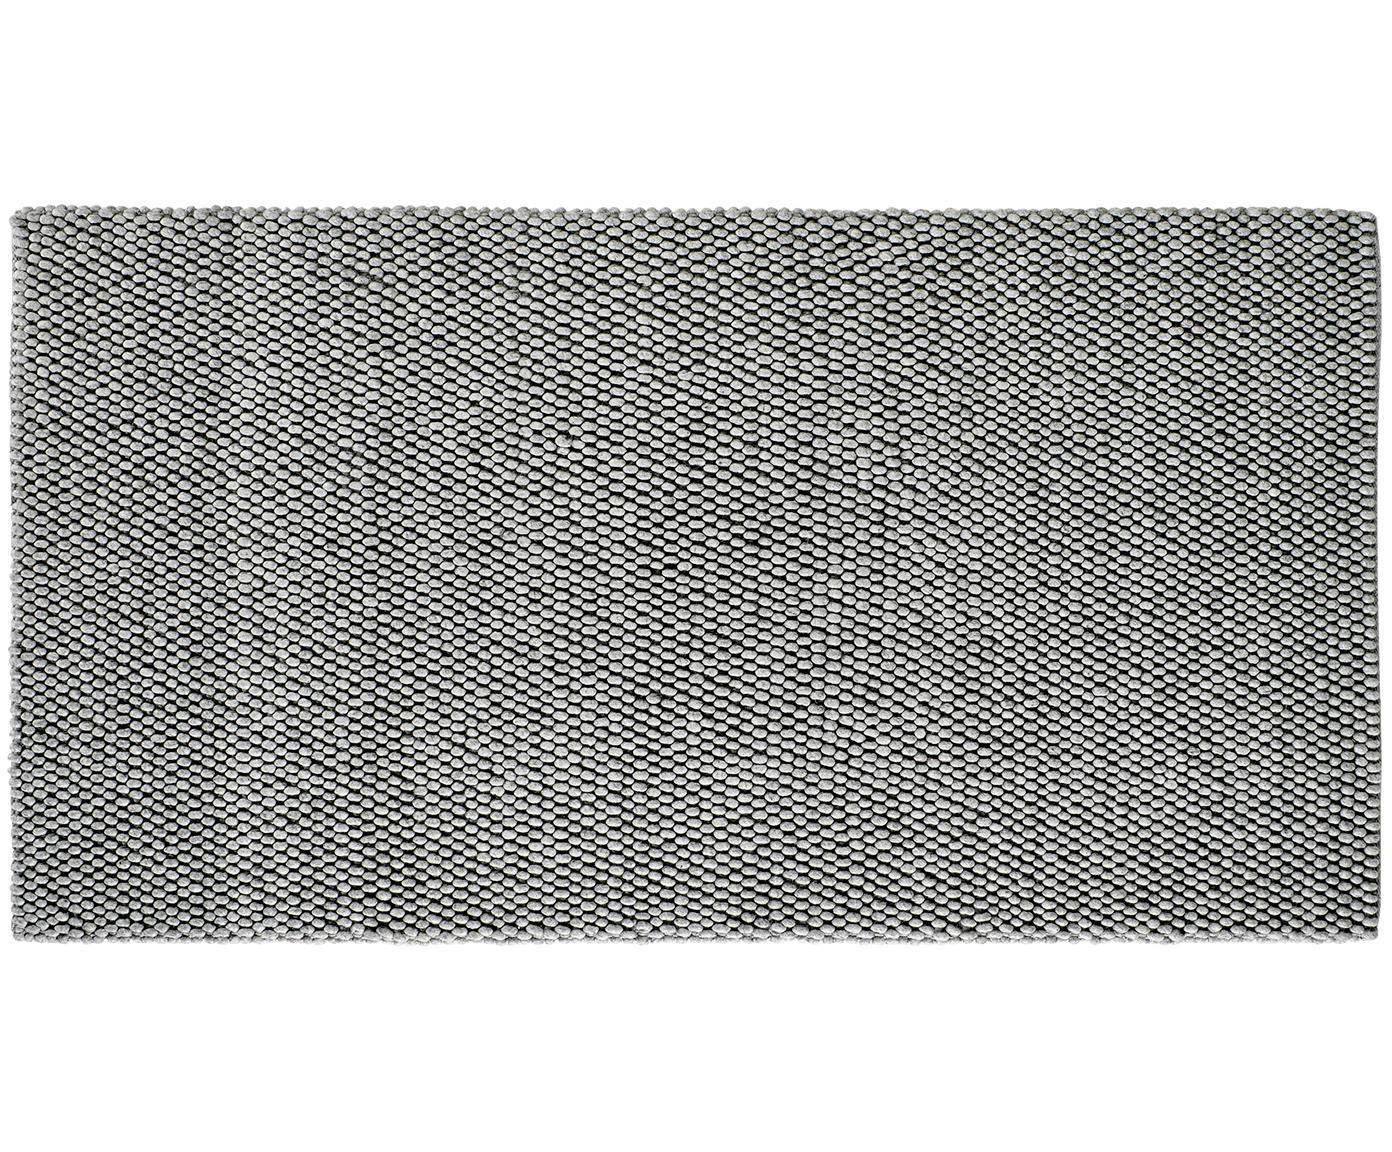 Alfombra artesanal de lana My Loft, Parte superior: 60%lana, 40%viscosa, Reverso: algodón, Gris plata, An 80 x L 150 cm (Tamaño XS)